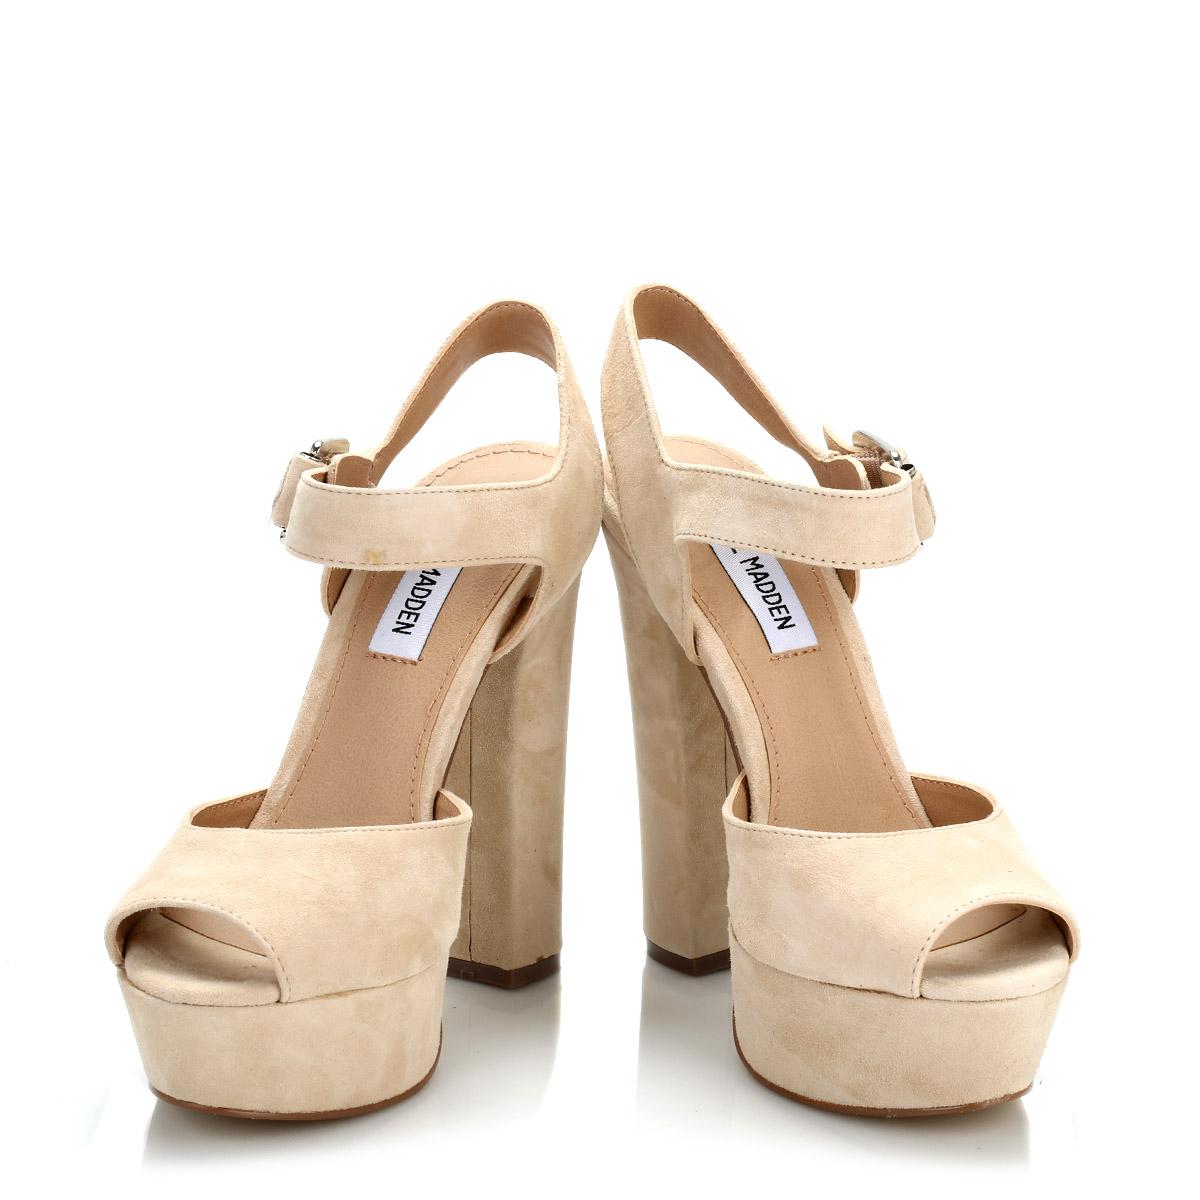 steve madden womens blush jillyy suede high heels beige. Black Bedroom Furniture Sets. Home Design Ideas